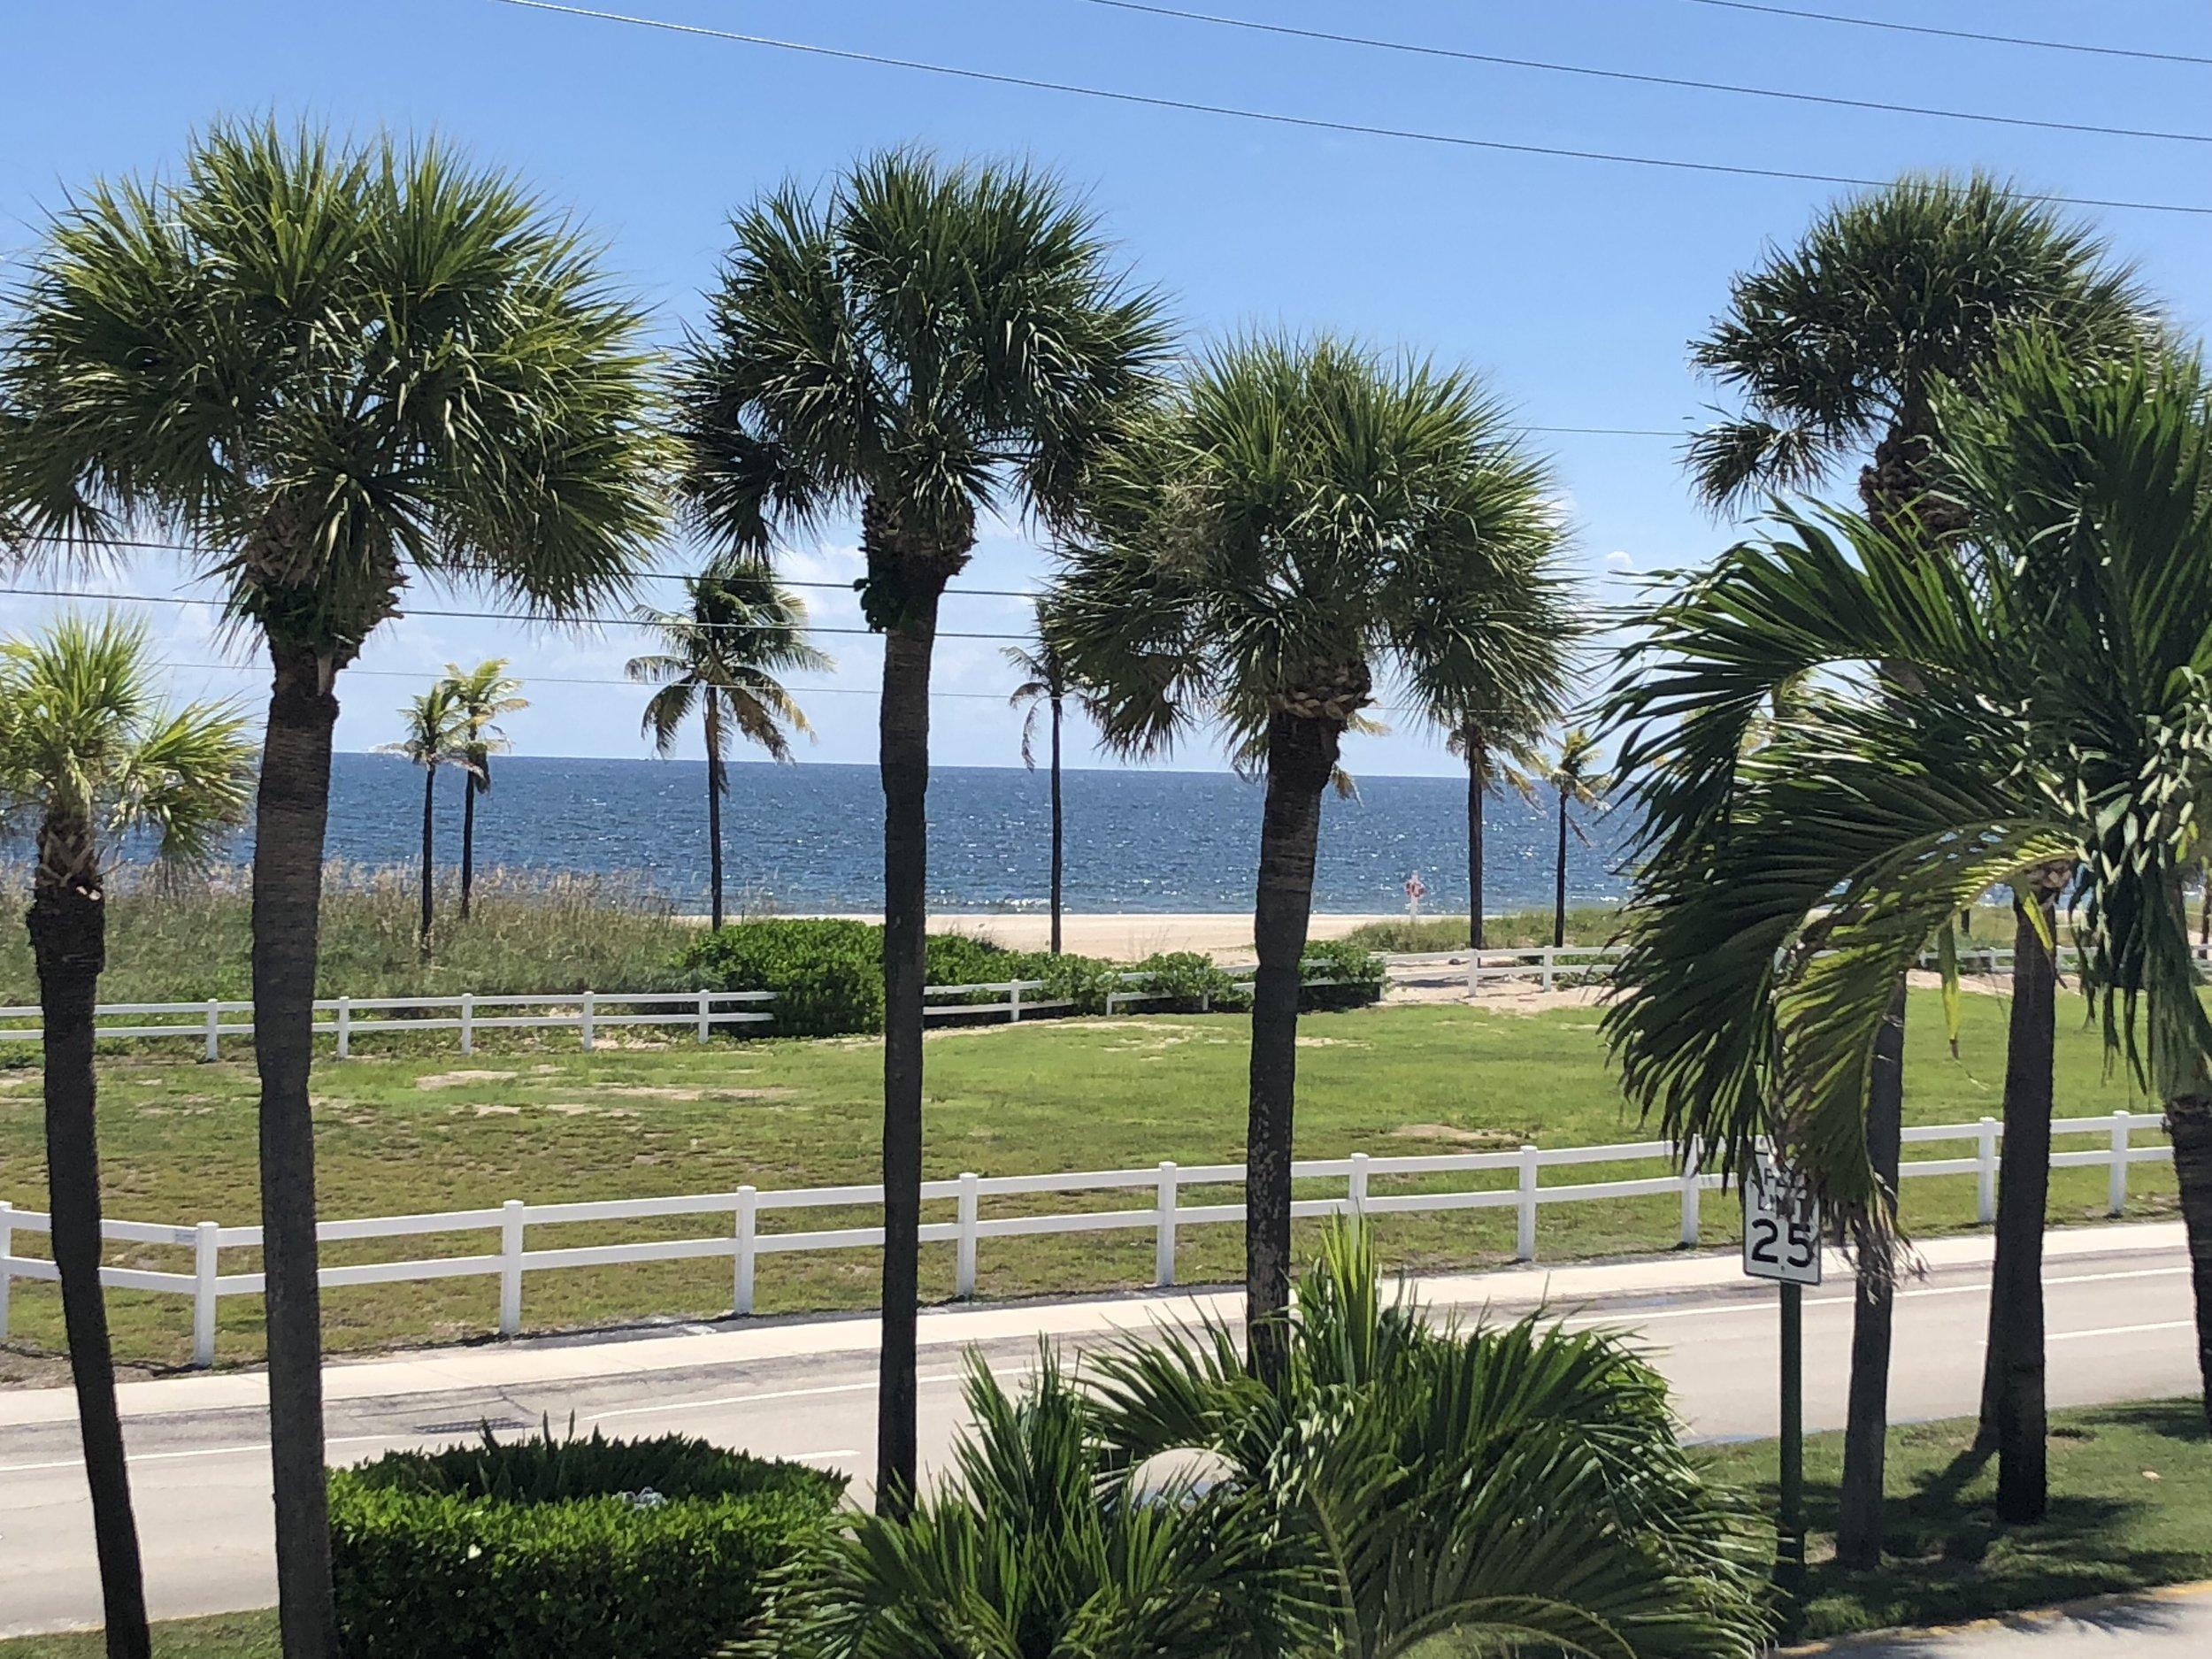 beachview.jpeg